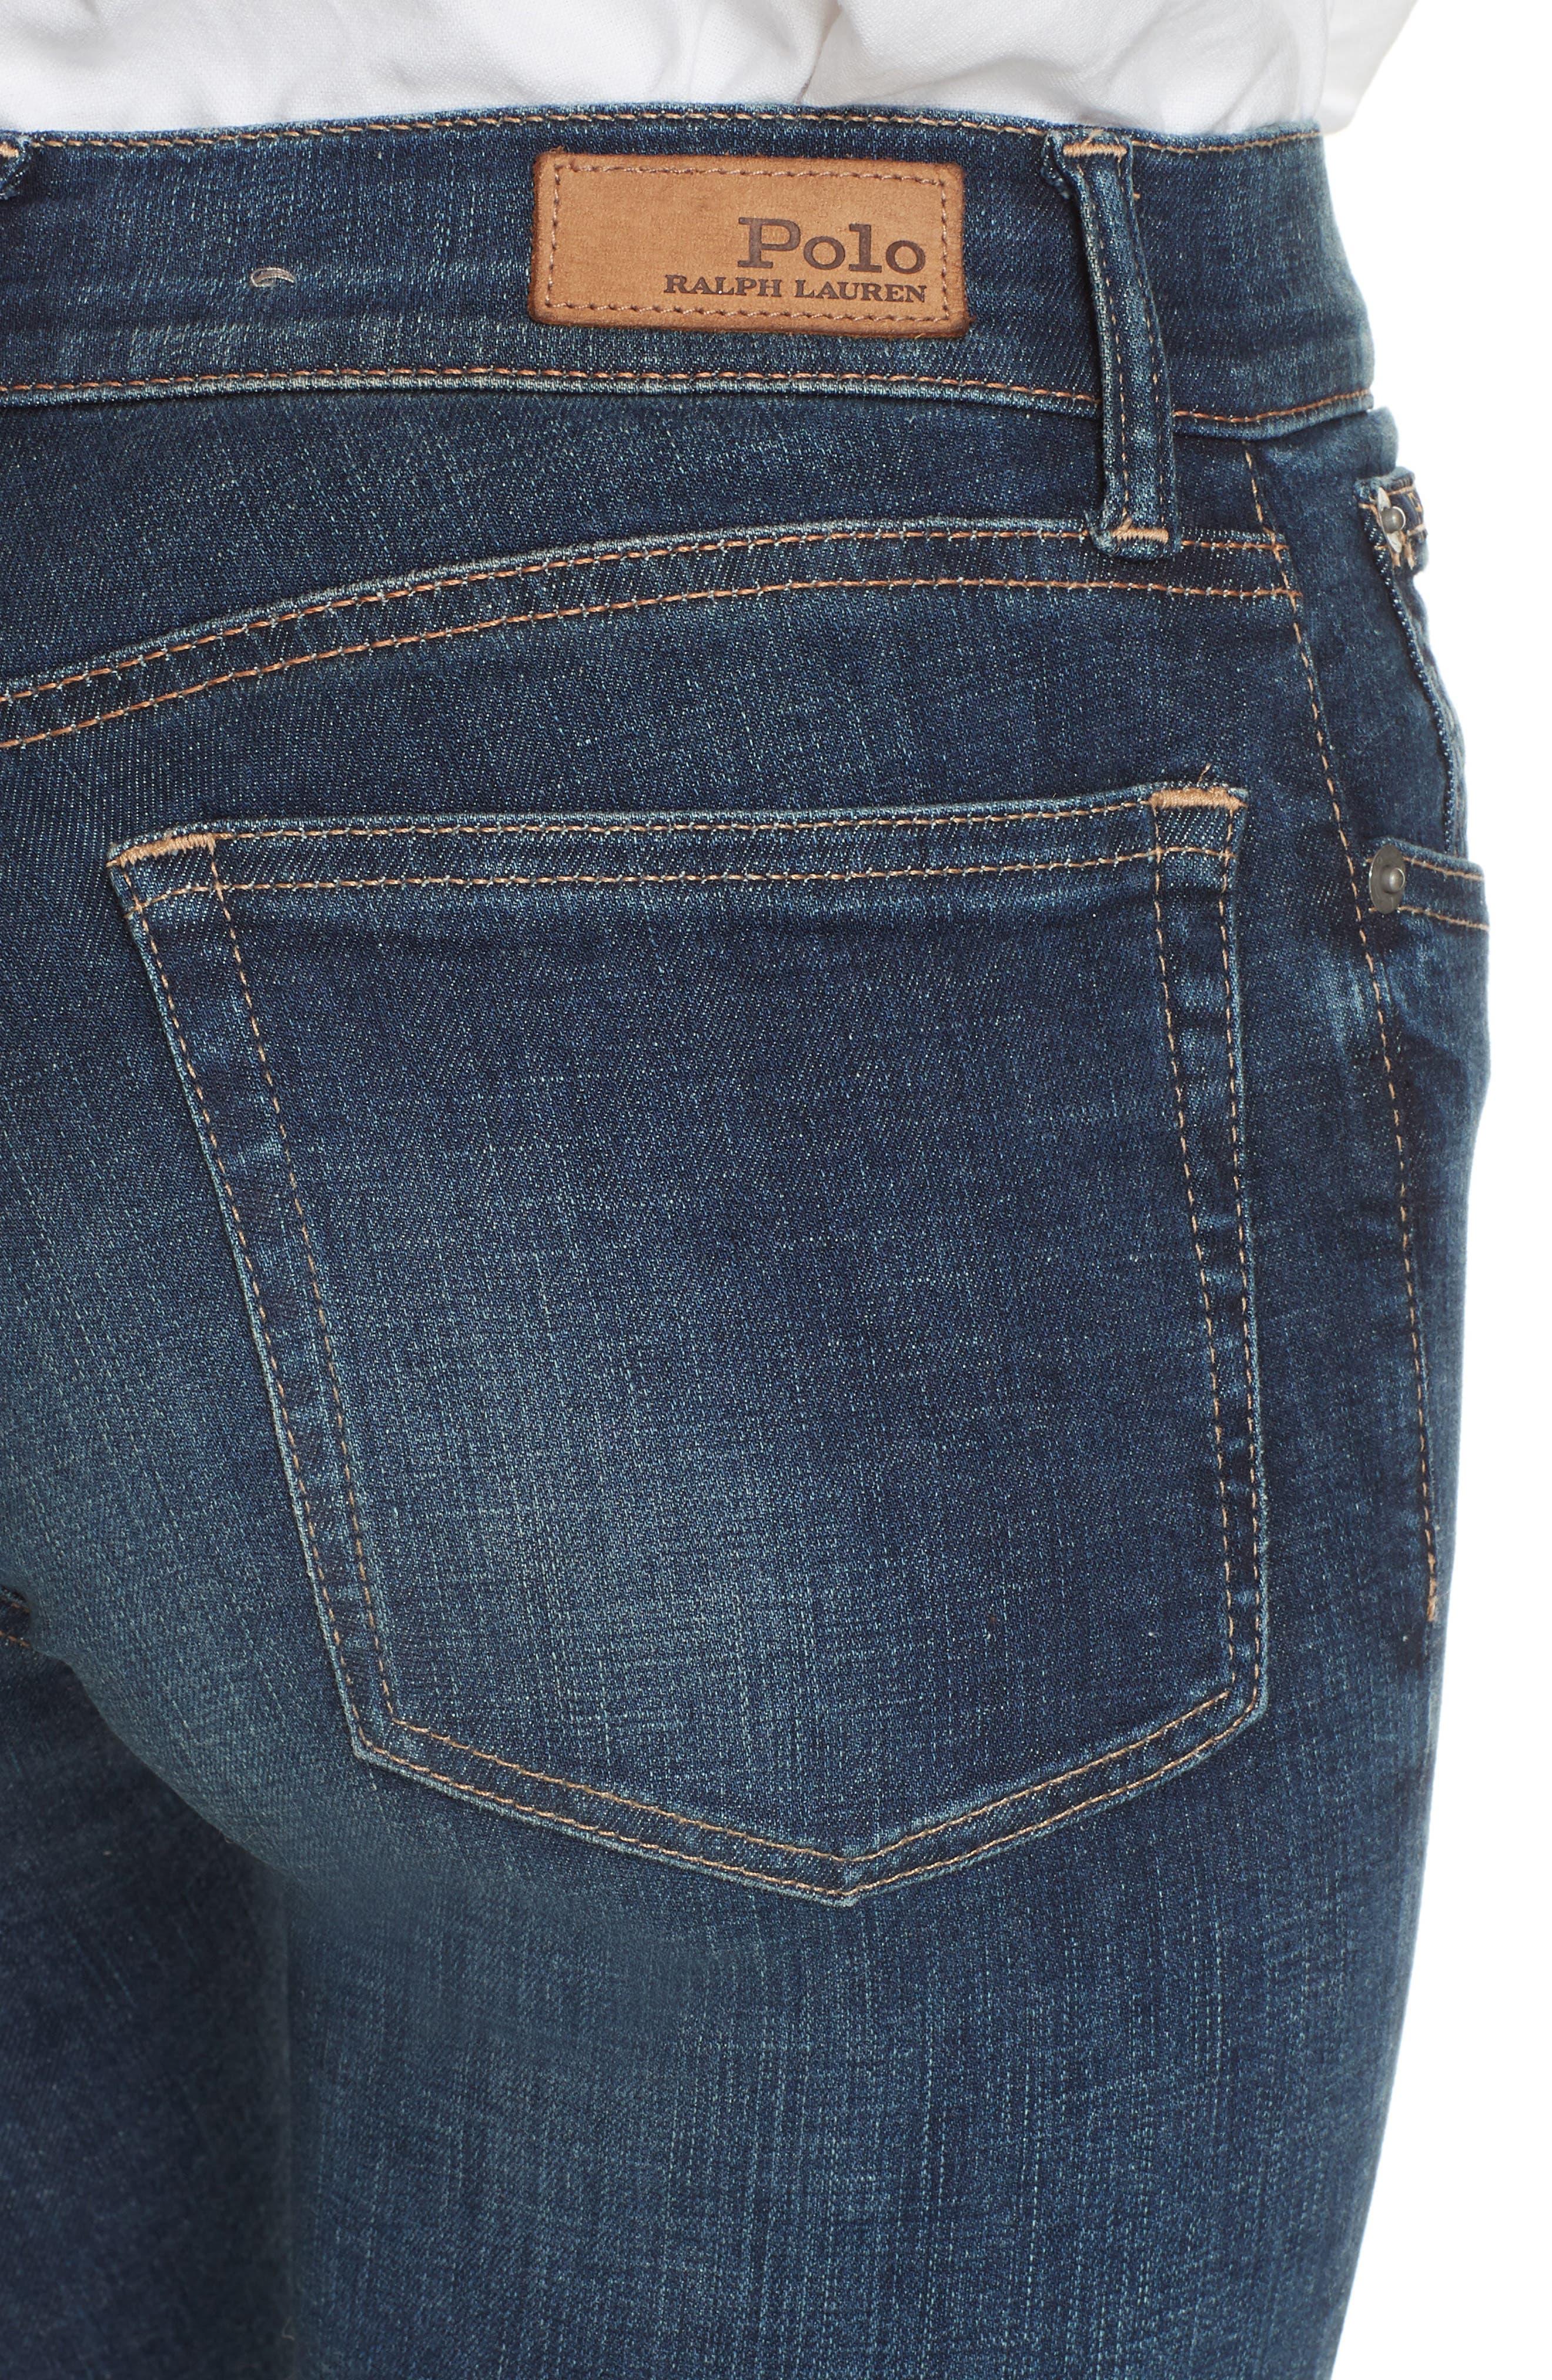 Super Skinny Jeans,                             Alternate thumbnail 4, color,                             DARK INDIGO